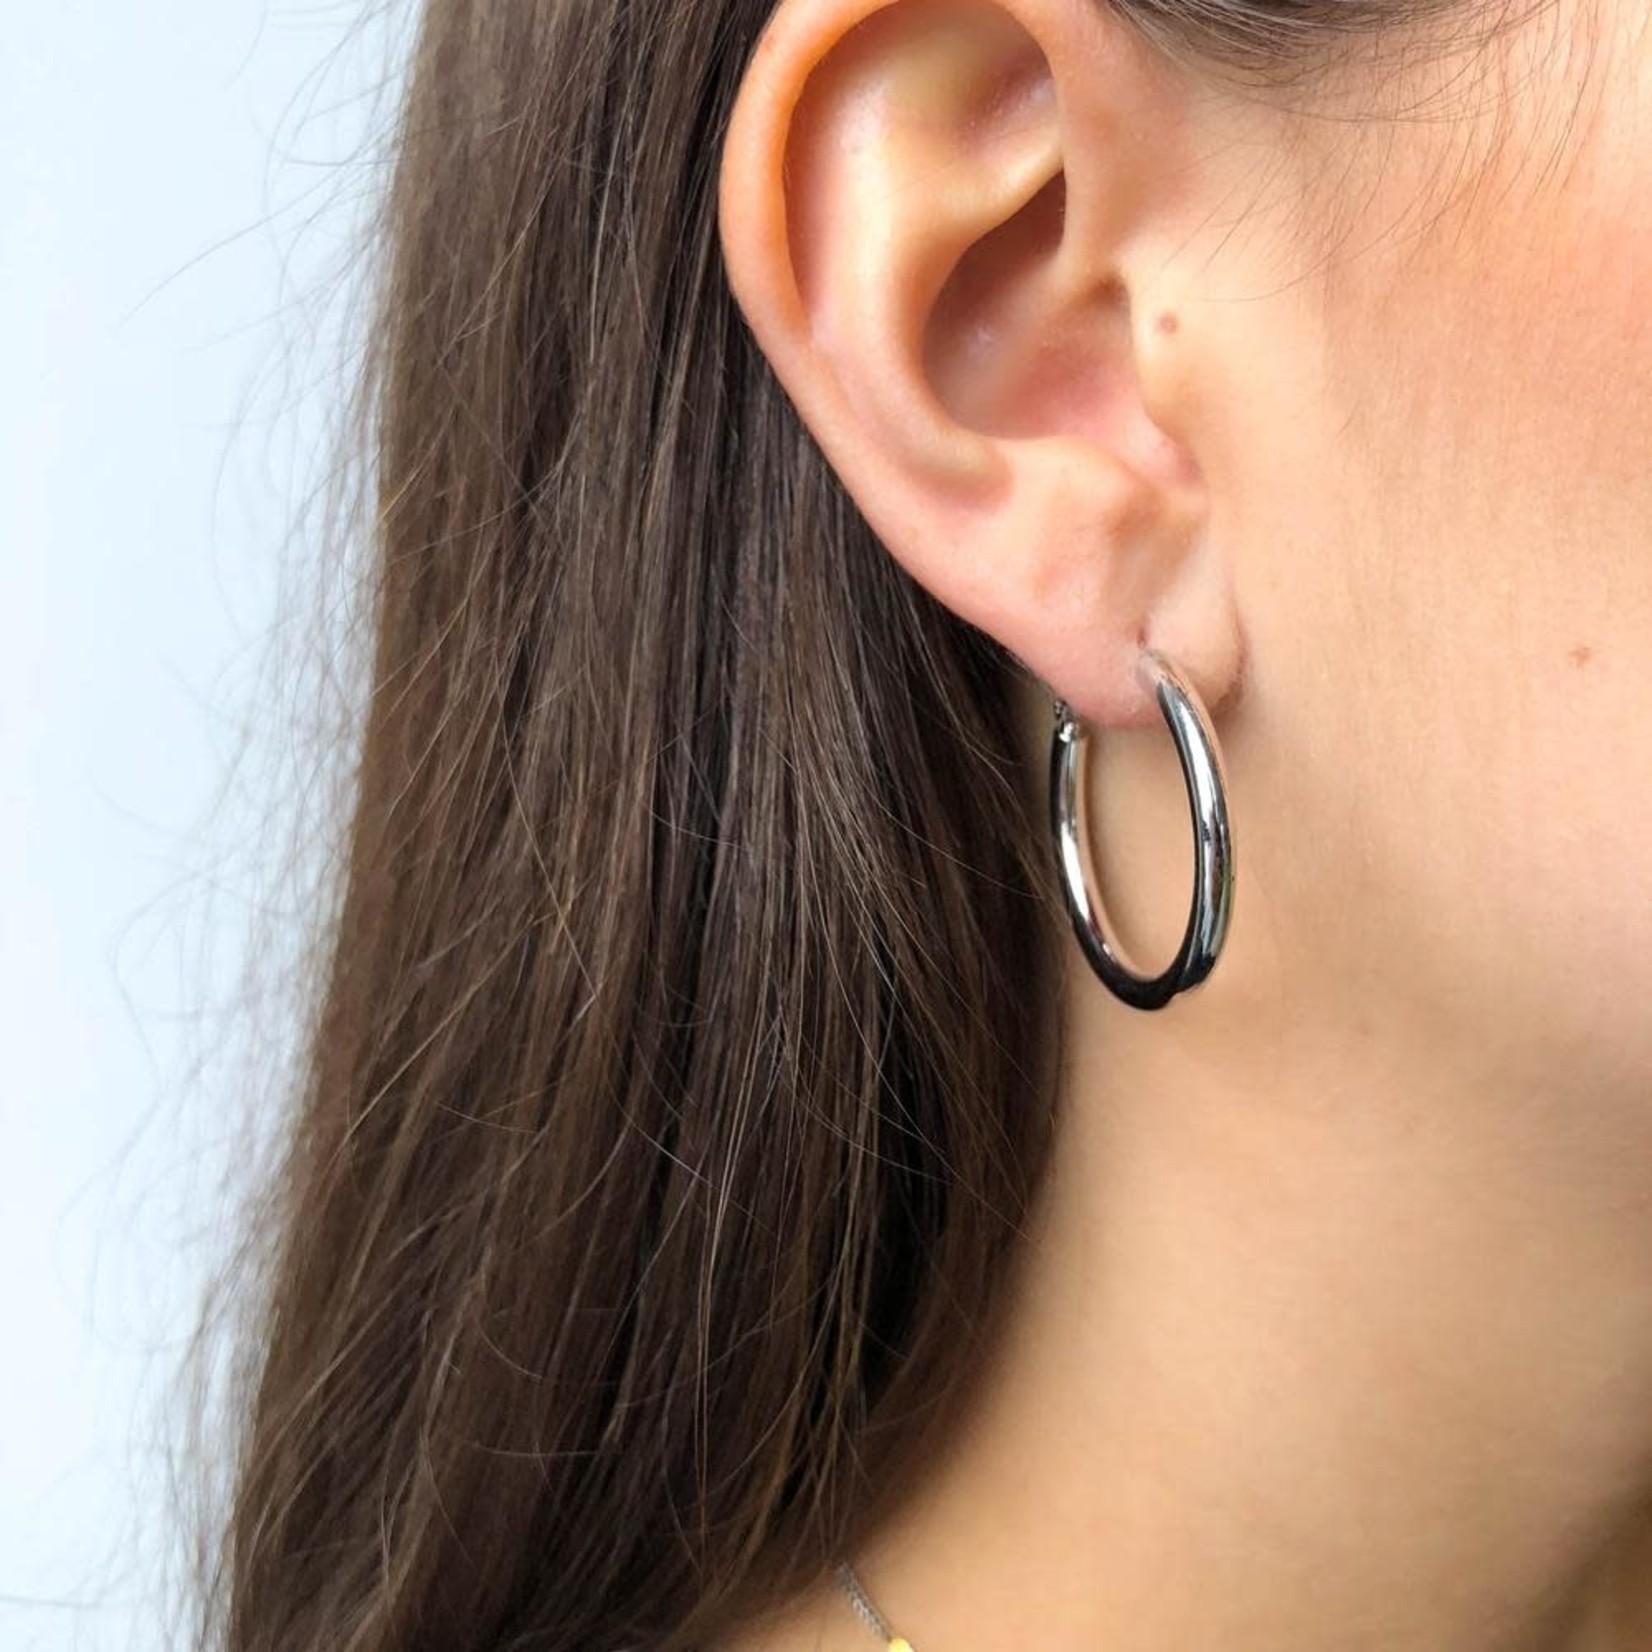 Horace Jewelry Horace boucles d'oreilles FINNA